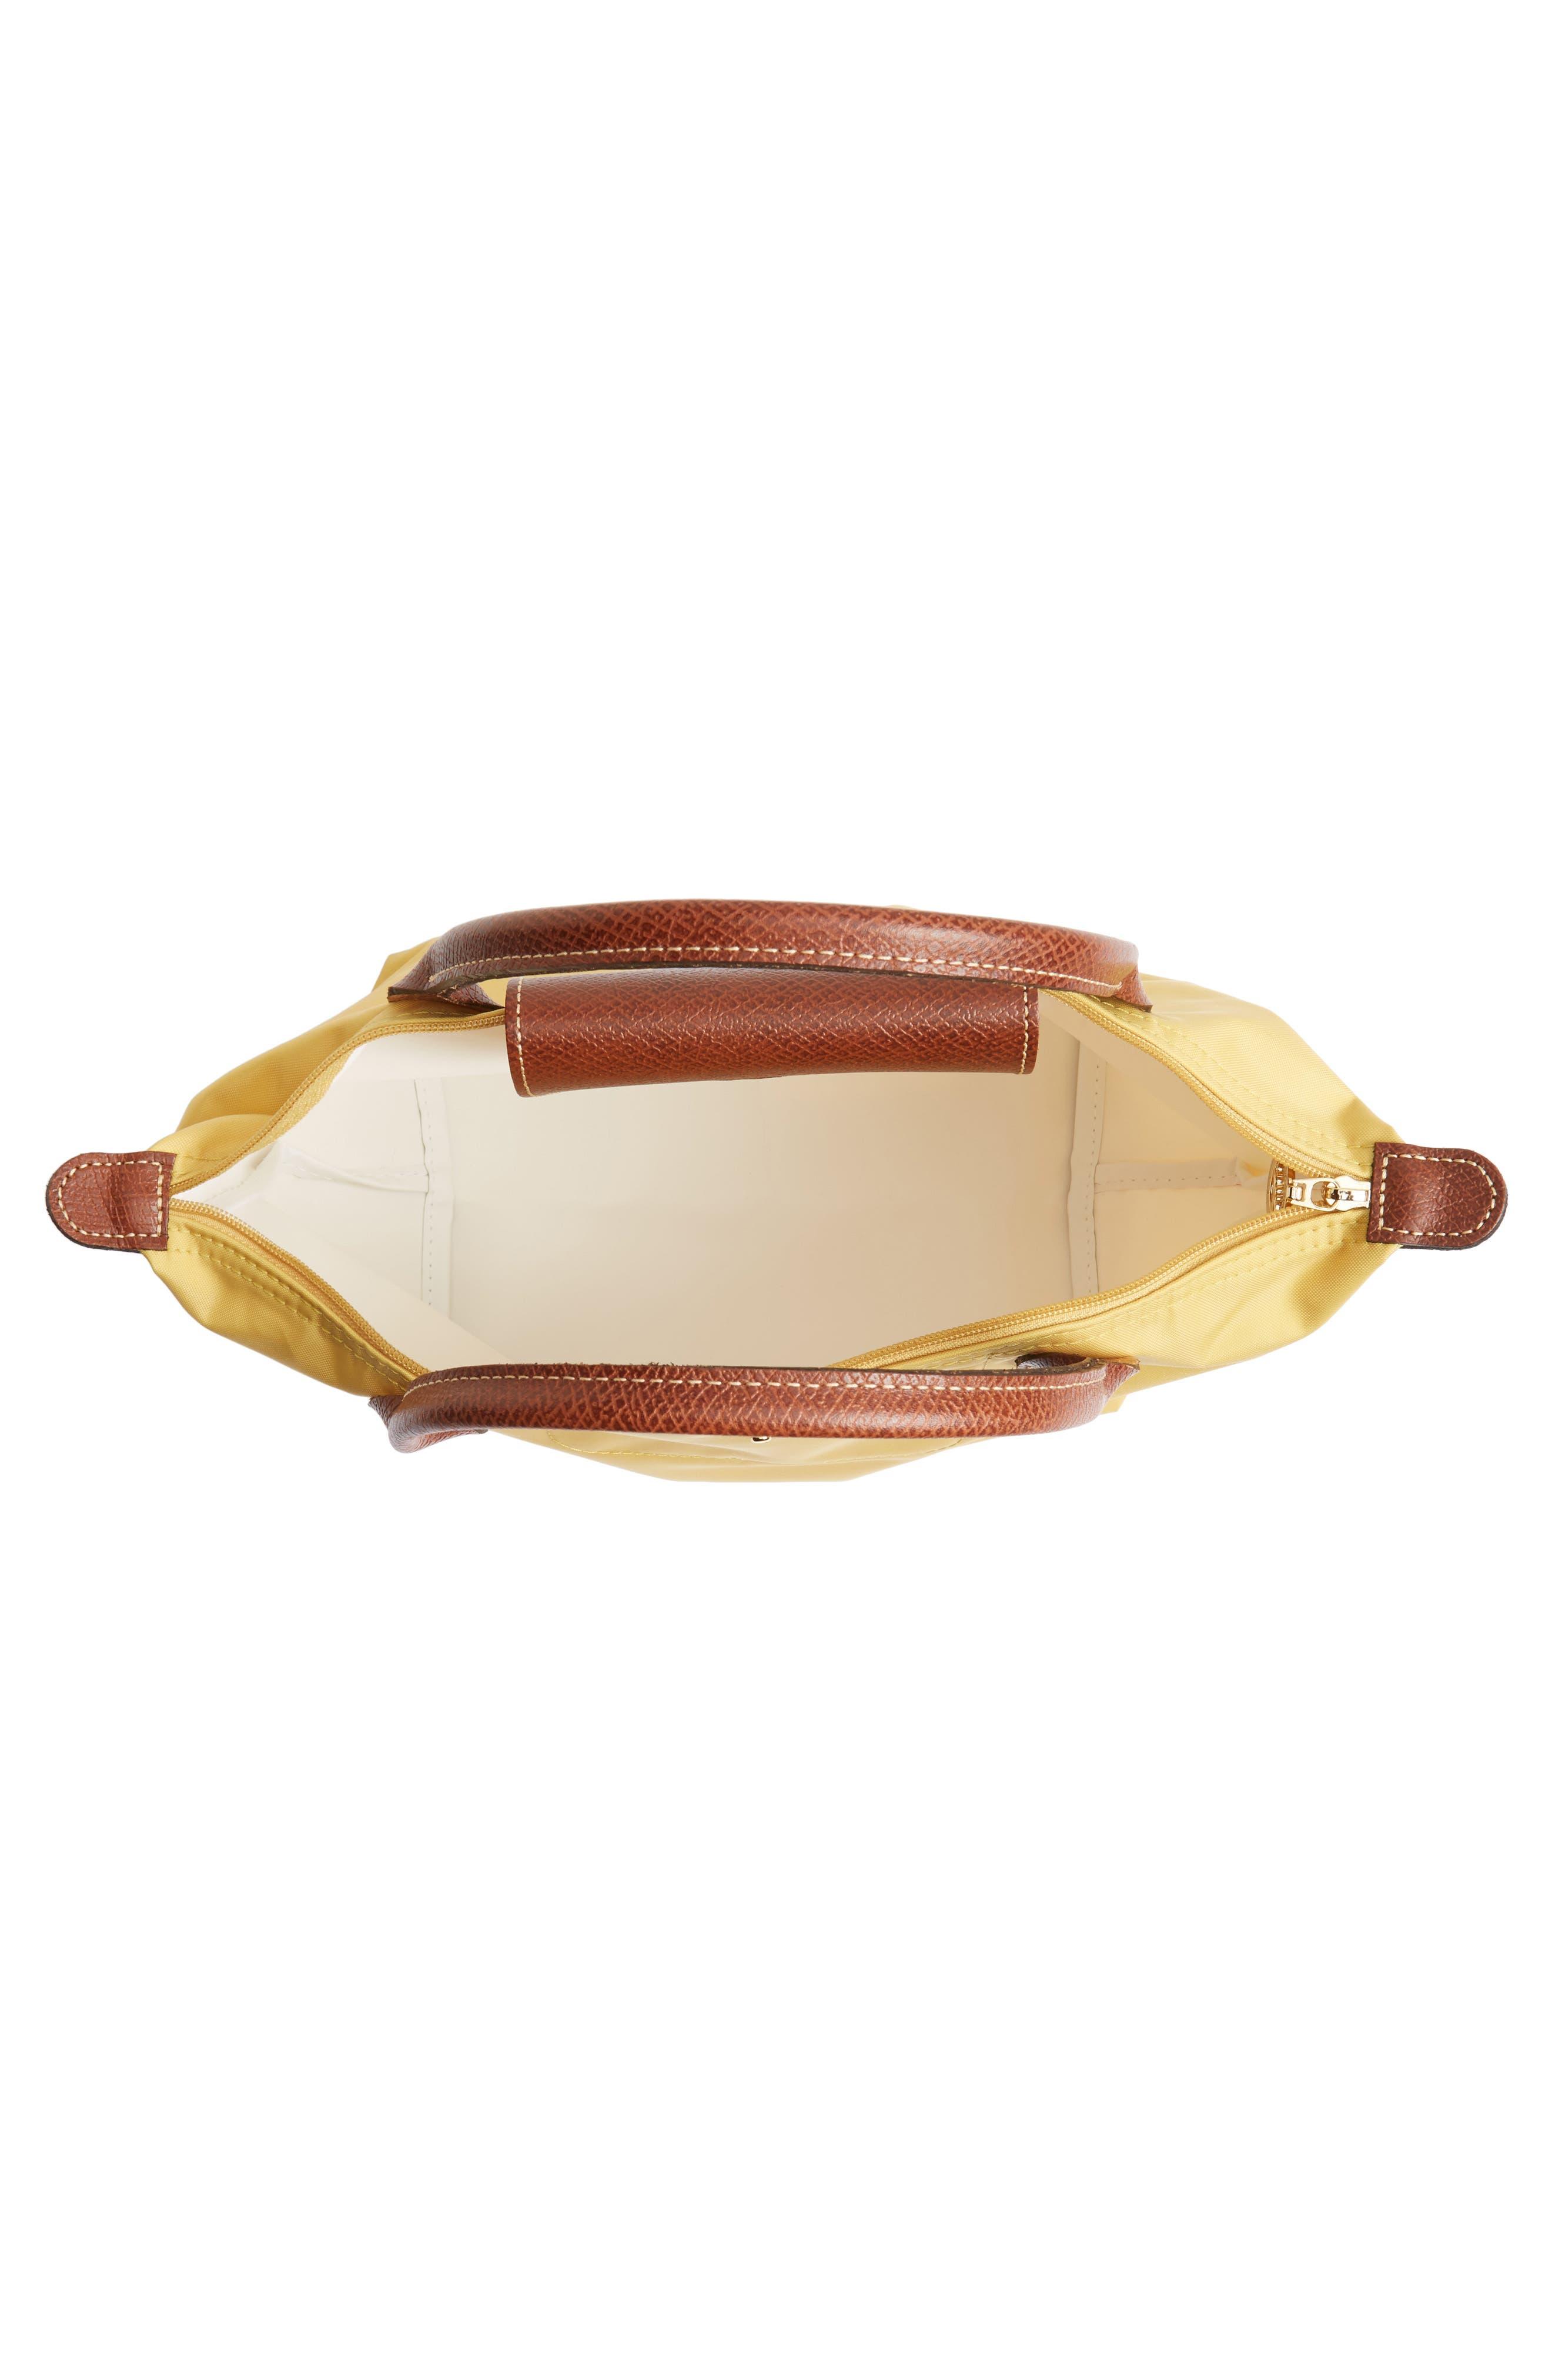 Alternate Image 3  - Longchamp 'Mini Le Pliage' Handbag